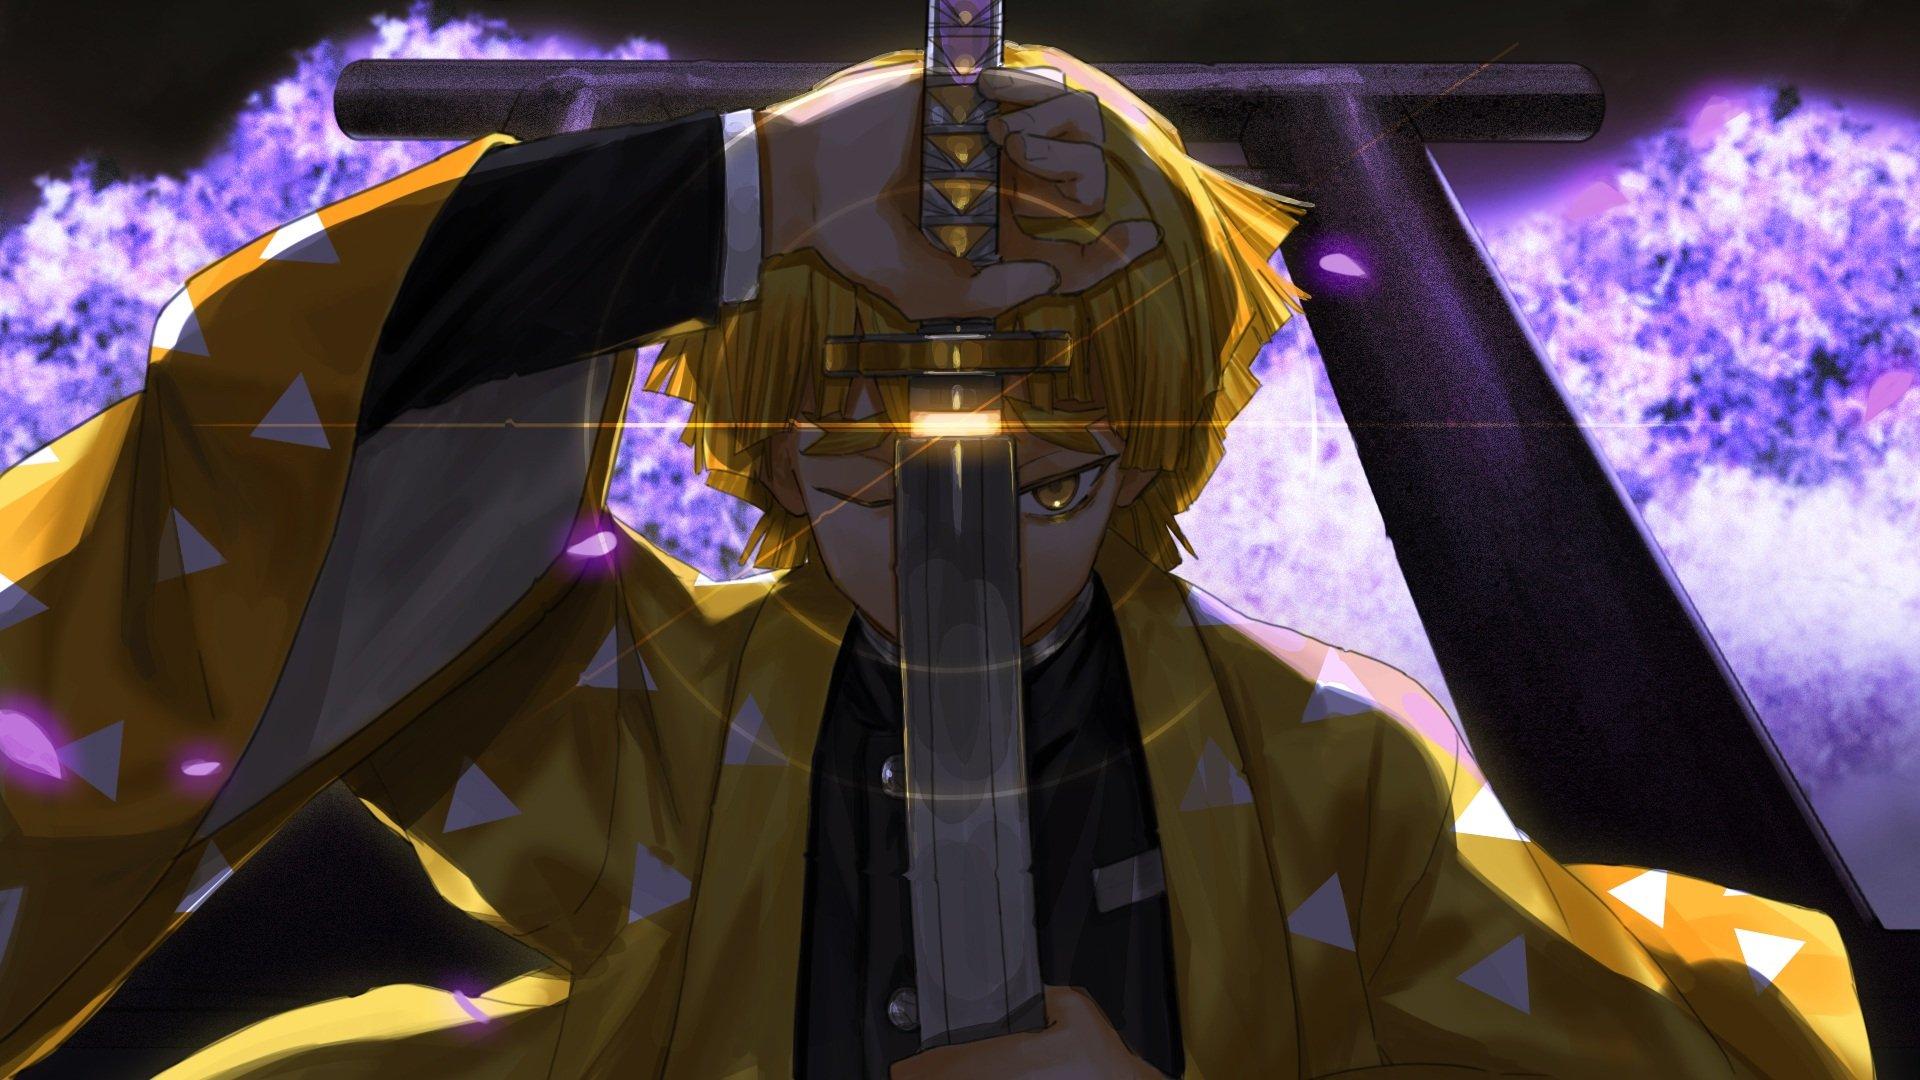 Fondos de pantalla Anime Zenitsu Agatsuma personaje de Guardianes de la noche